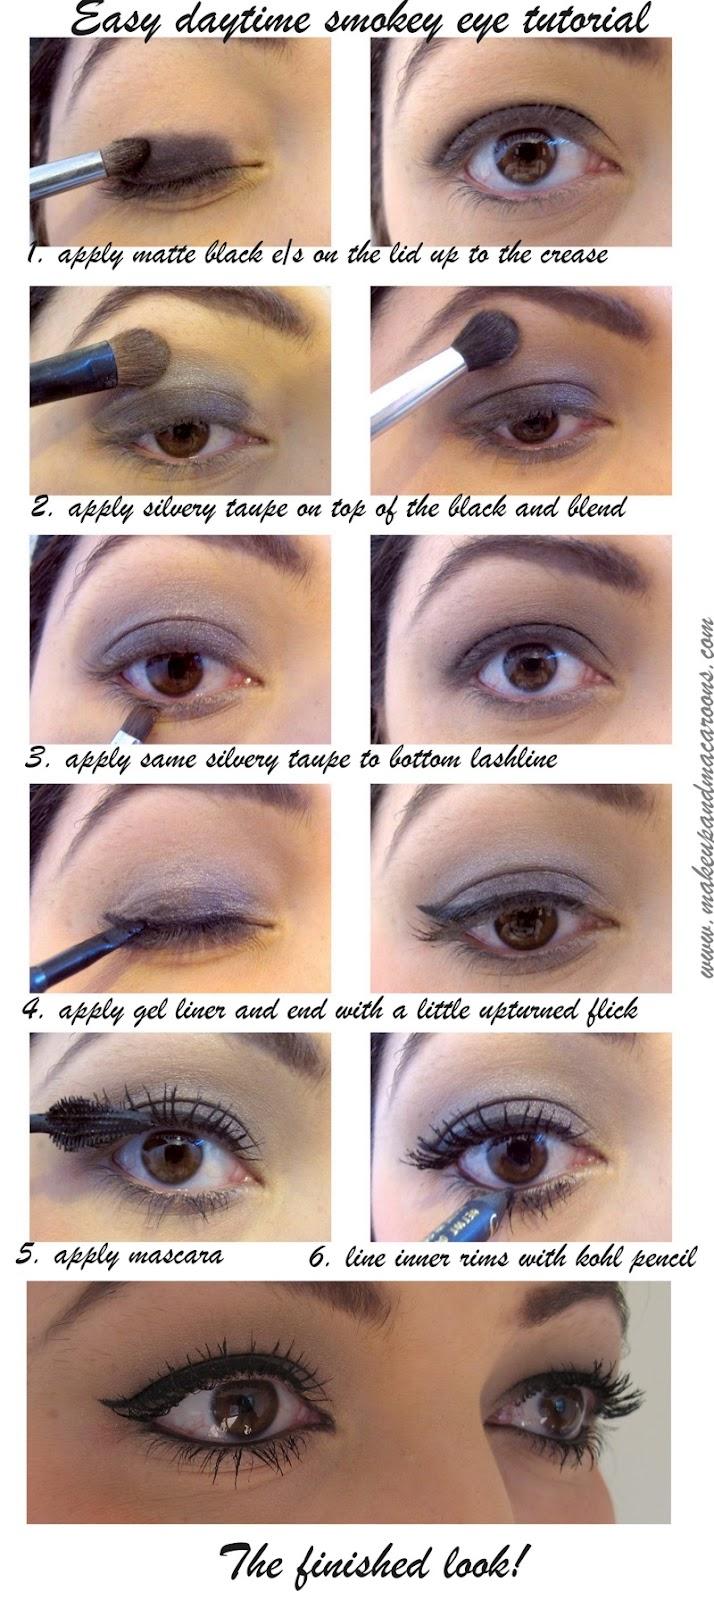 makeup and macaroons easy daytime smokey eye tutorial